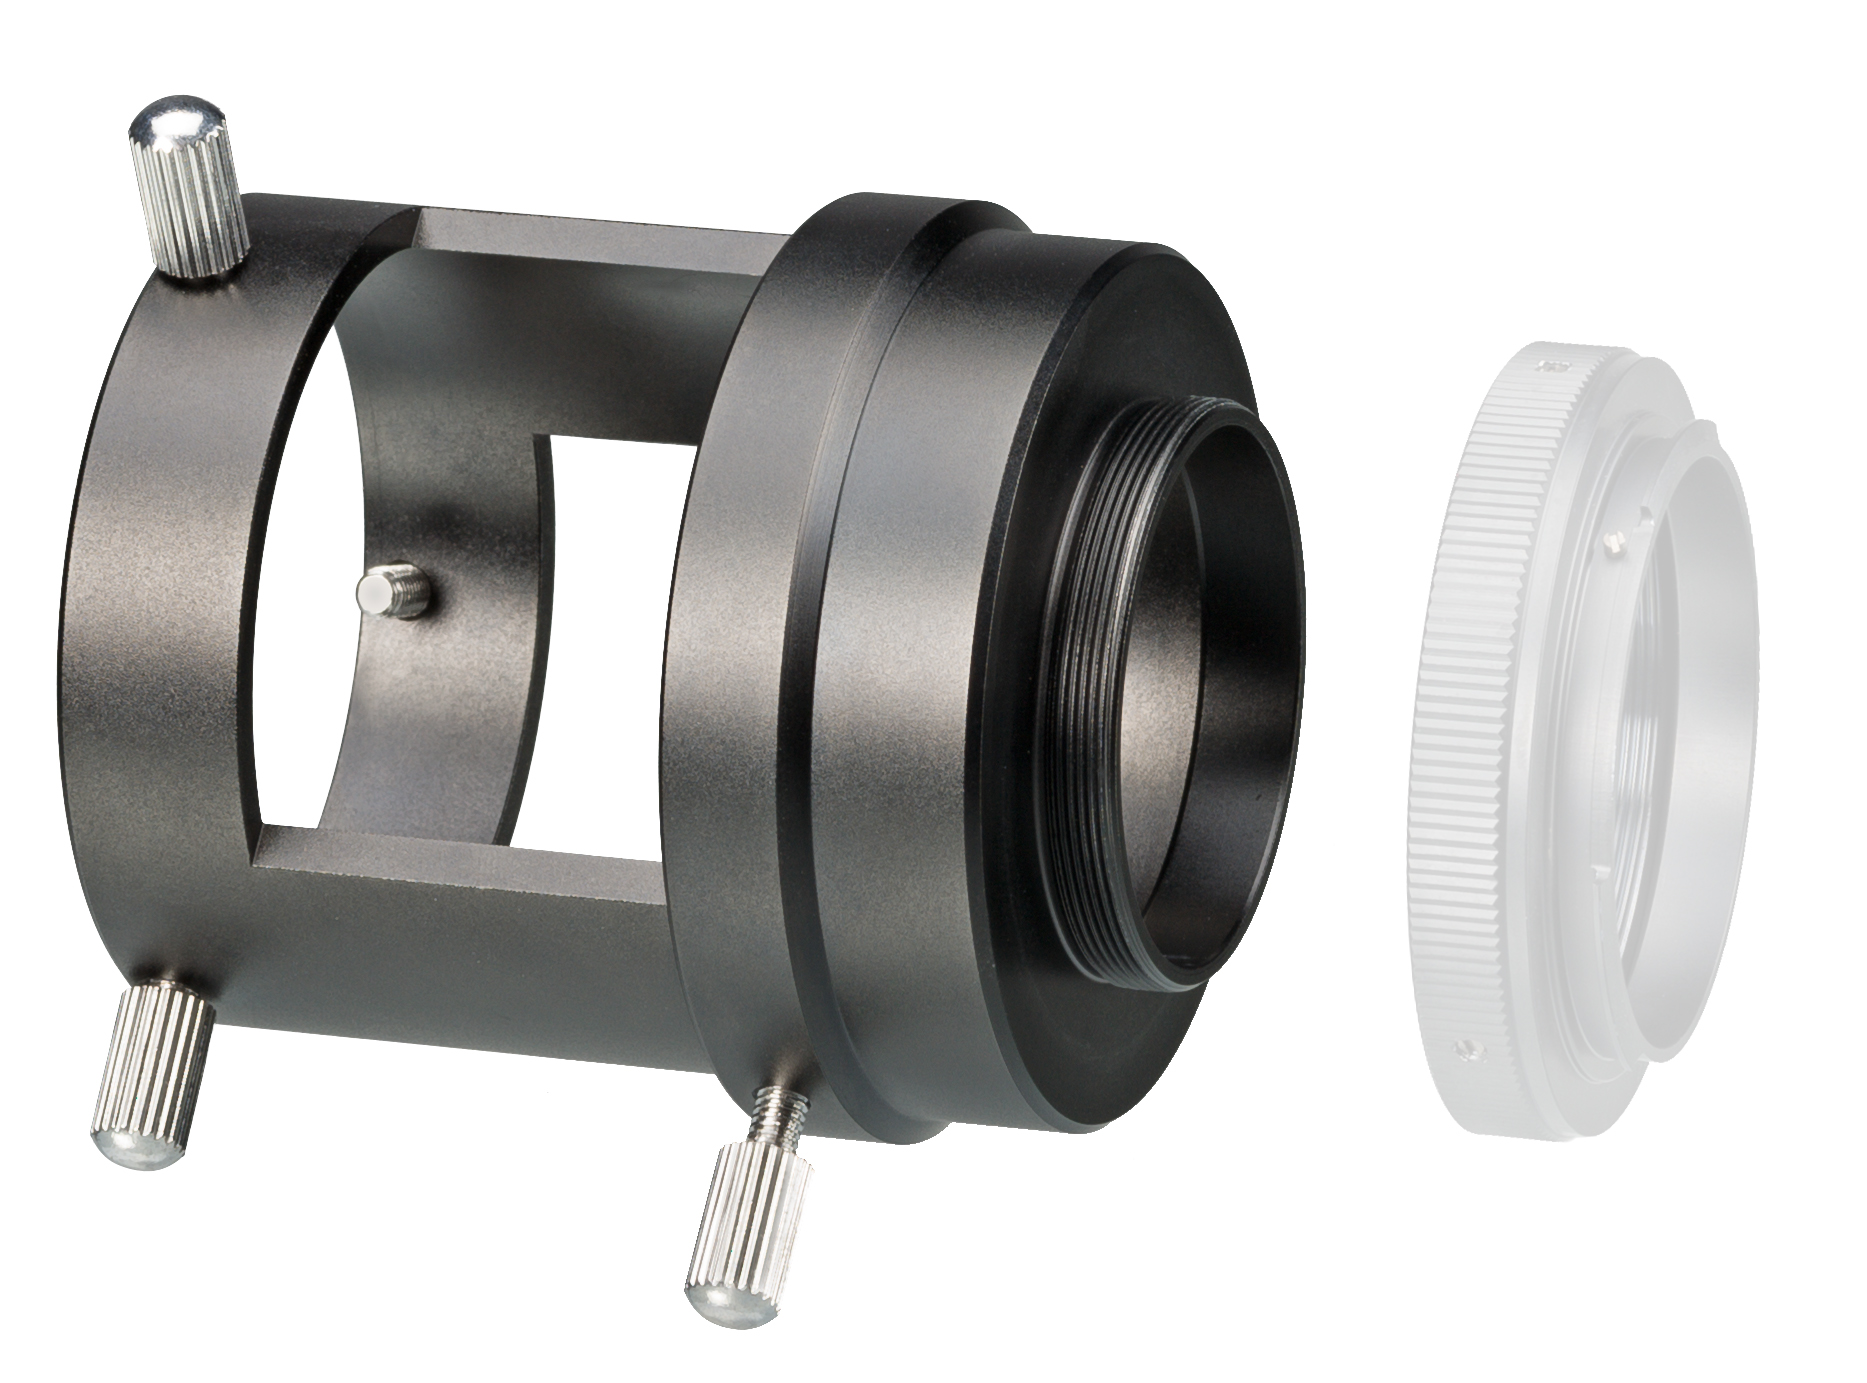 Bresser fotoadapter zum anschluss von dslr kameras an spektive der